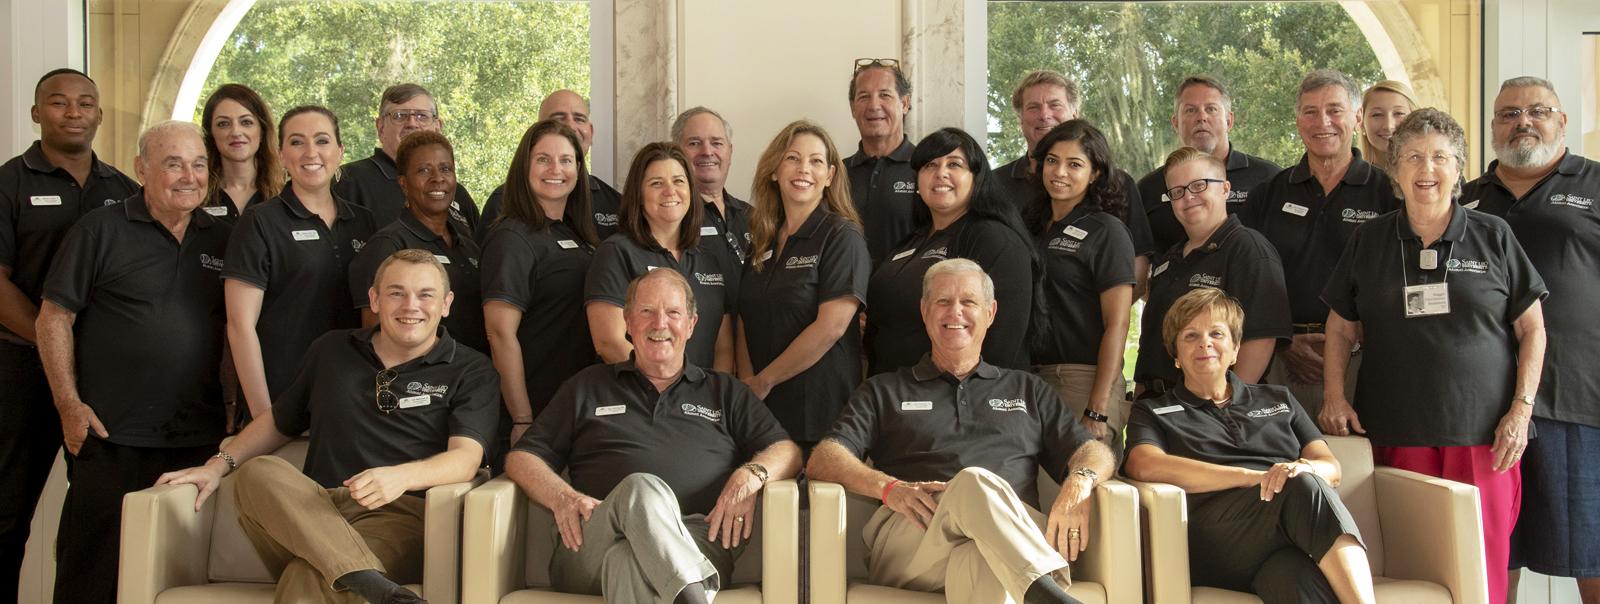 Alumni Board of Directors 2018